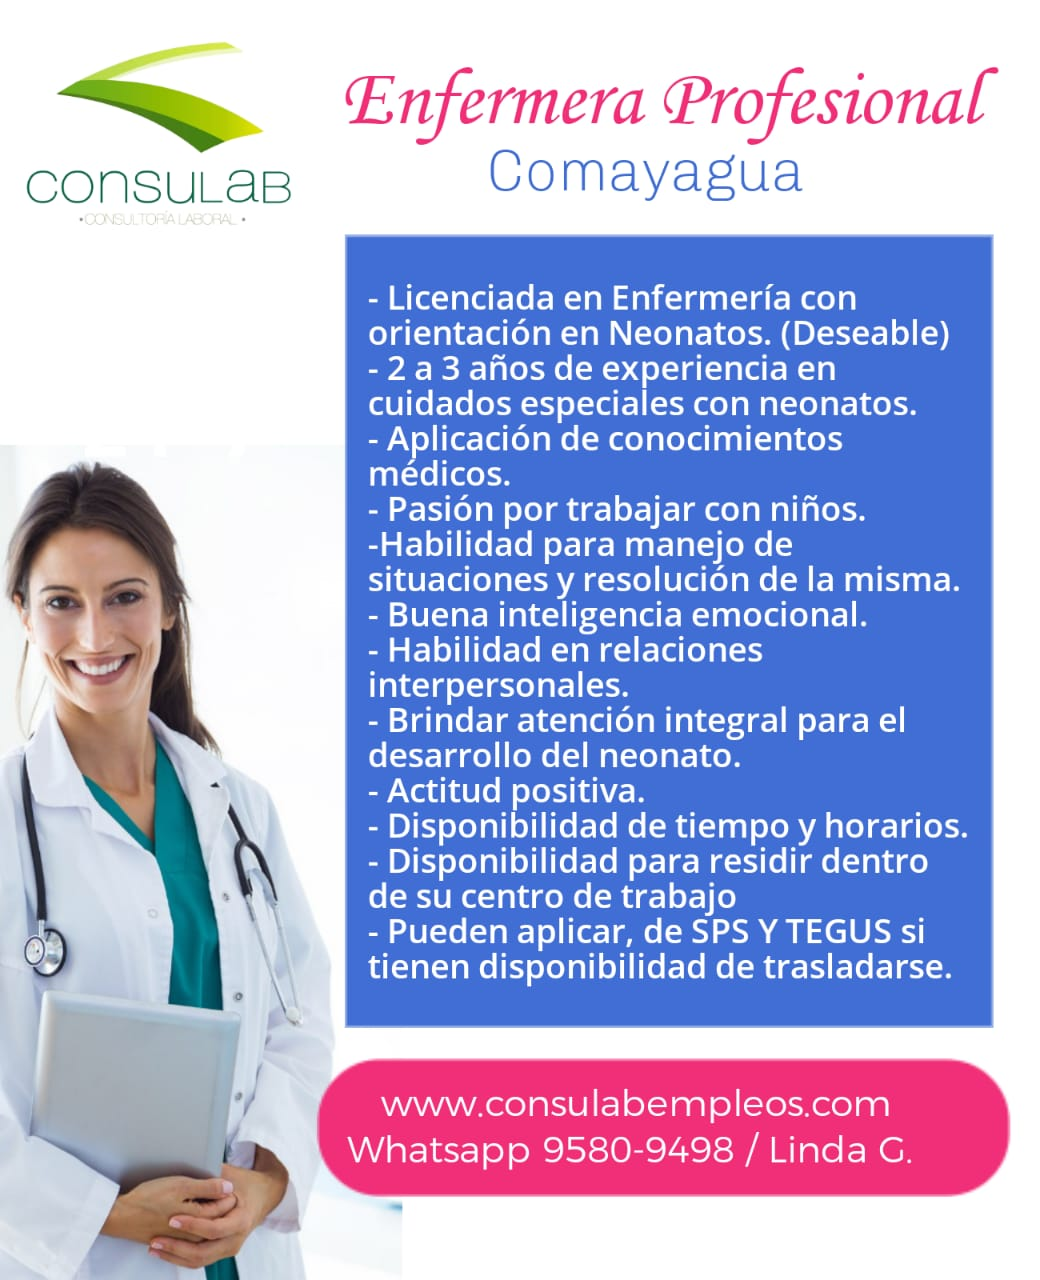 Enfermera profesional en Comayagua